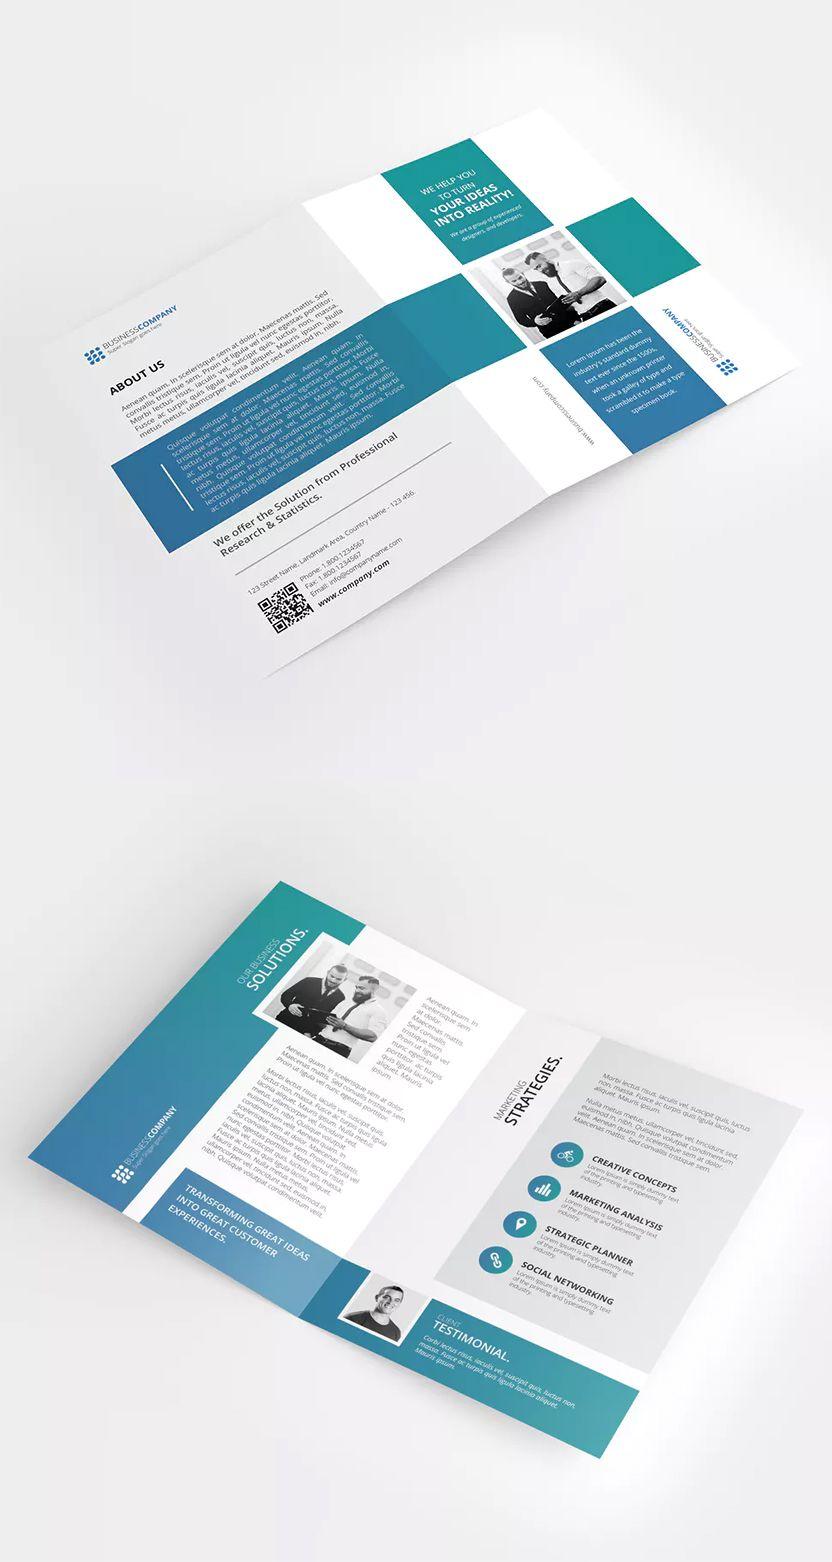 a4 bi fold brochure template psd clean and modern layout cmyk